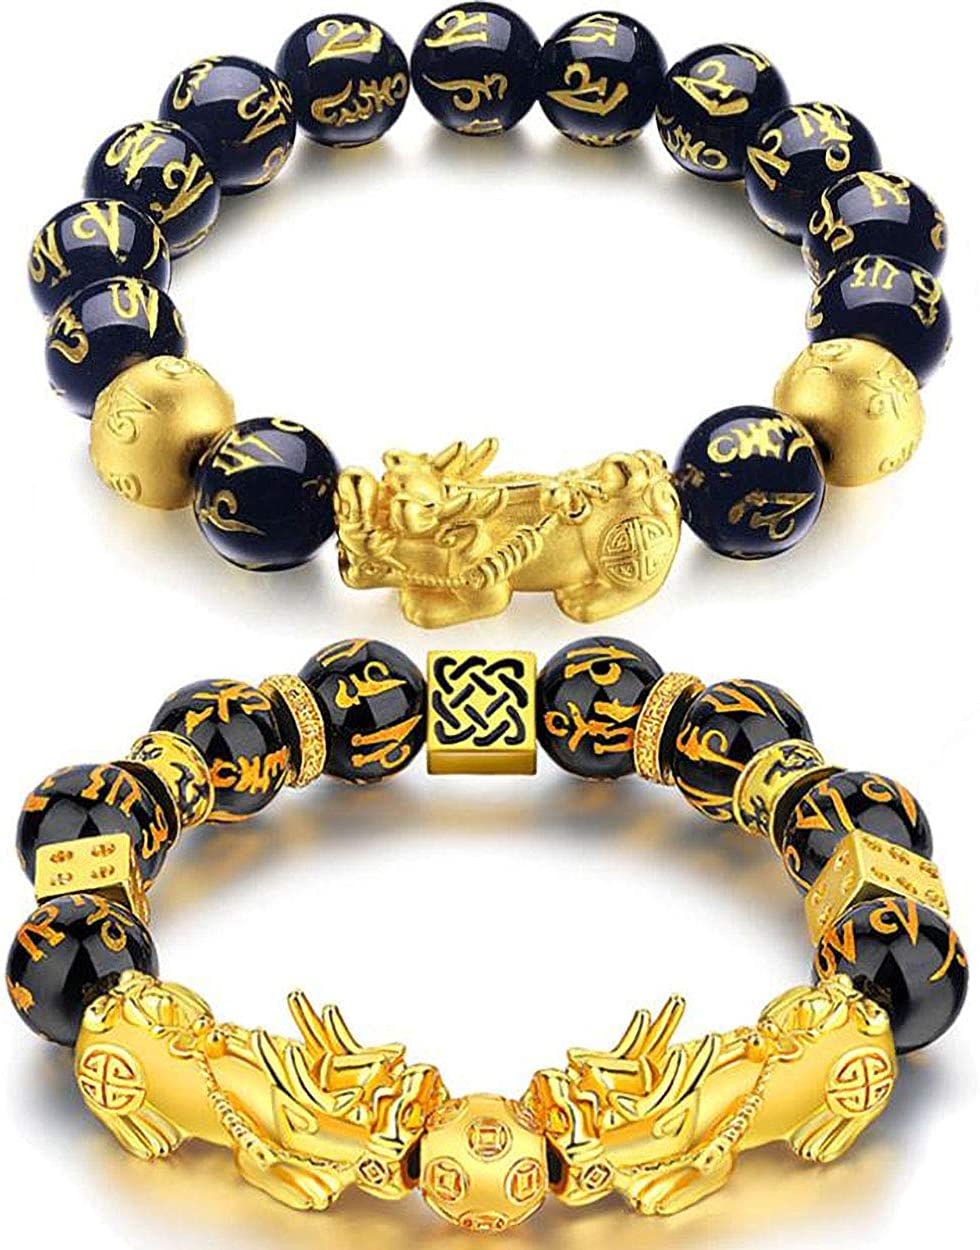 JEWPARK 1-4 Pcs Feng Shui Good Luck Bracelets for Men Women Obsidian Bead Dragon Lucky Charm Bracelet Pixiu Pi Yao Attract Wealth Money Feng Shui Jewelry